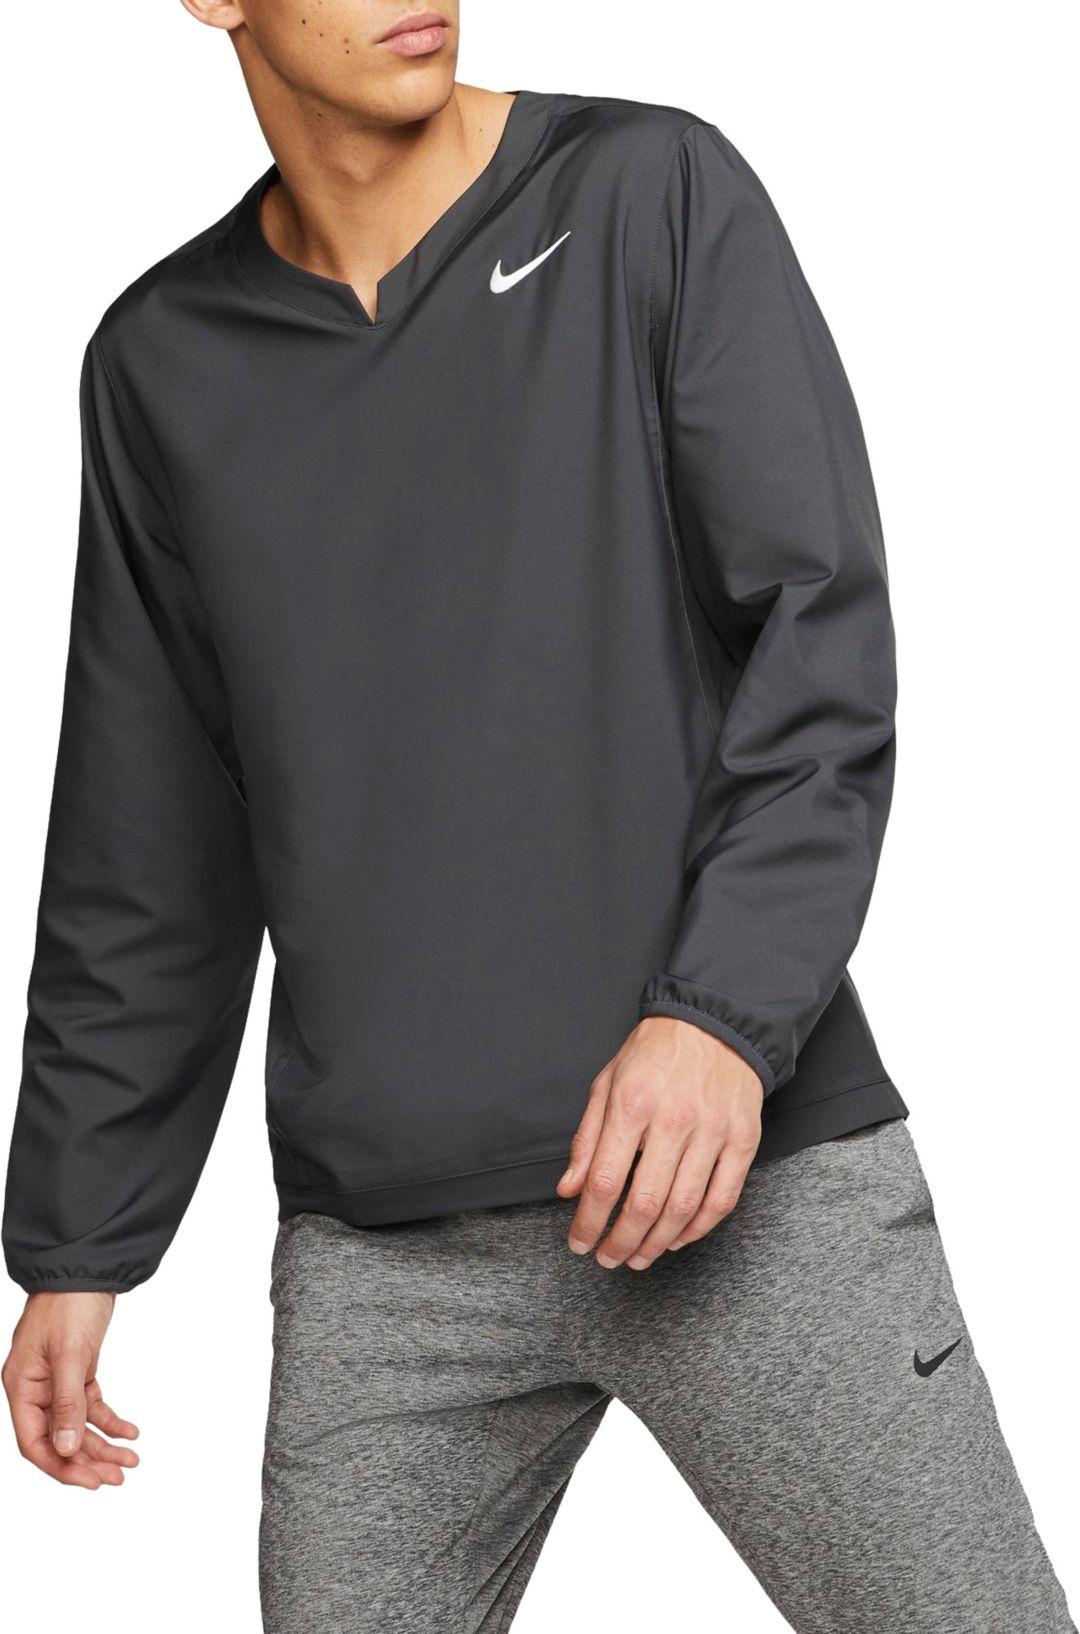 online store b4572 689bf Nike Men's Long-Sleeve Baseball Pullover Jacket